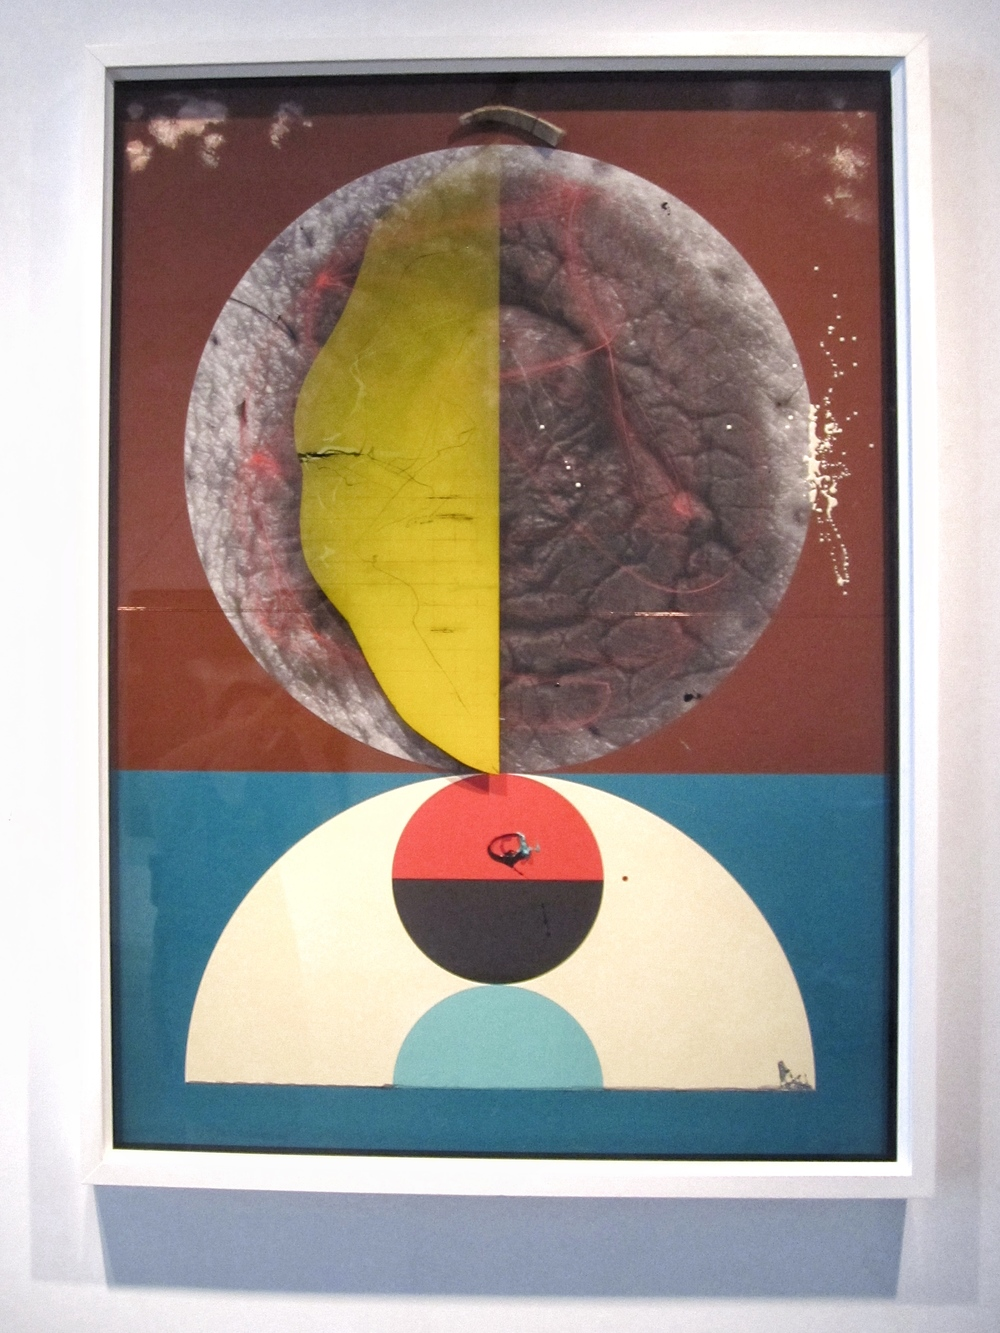 Aditya Pande , Half Life Form III , Mixed media on archival paper, 2012